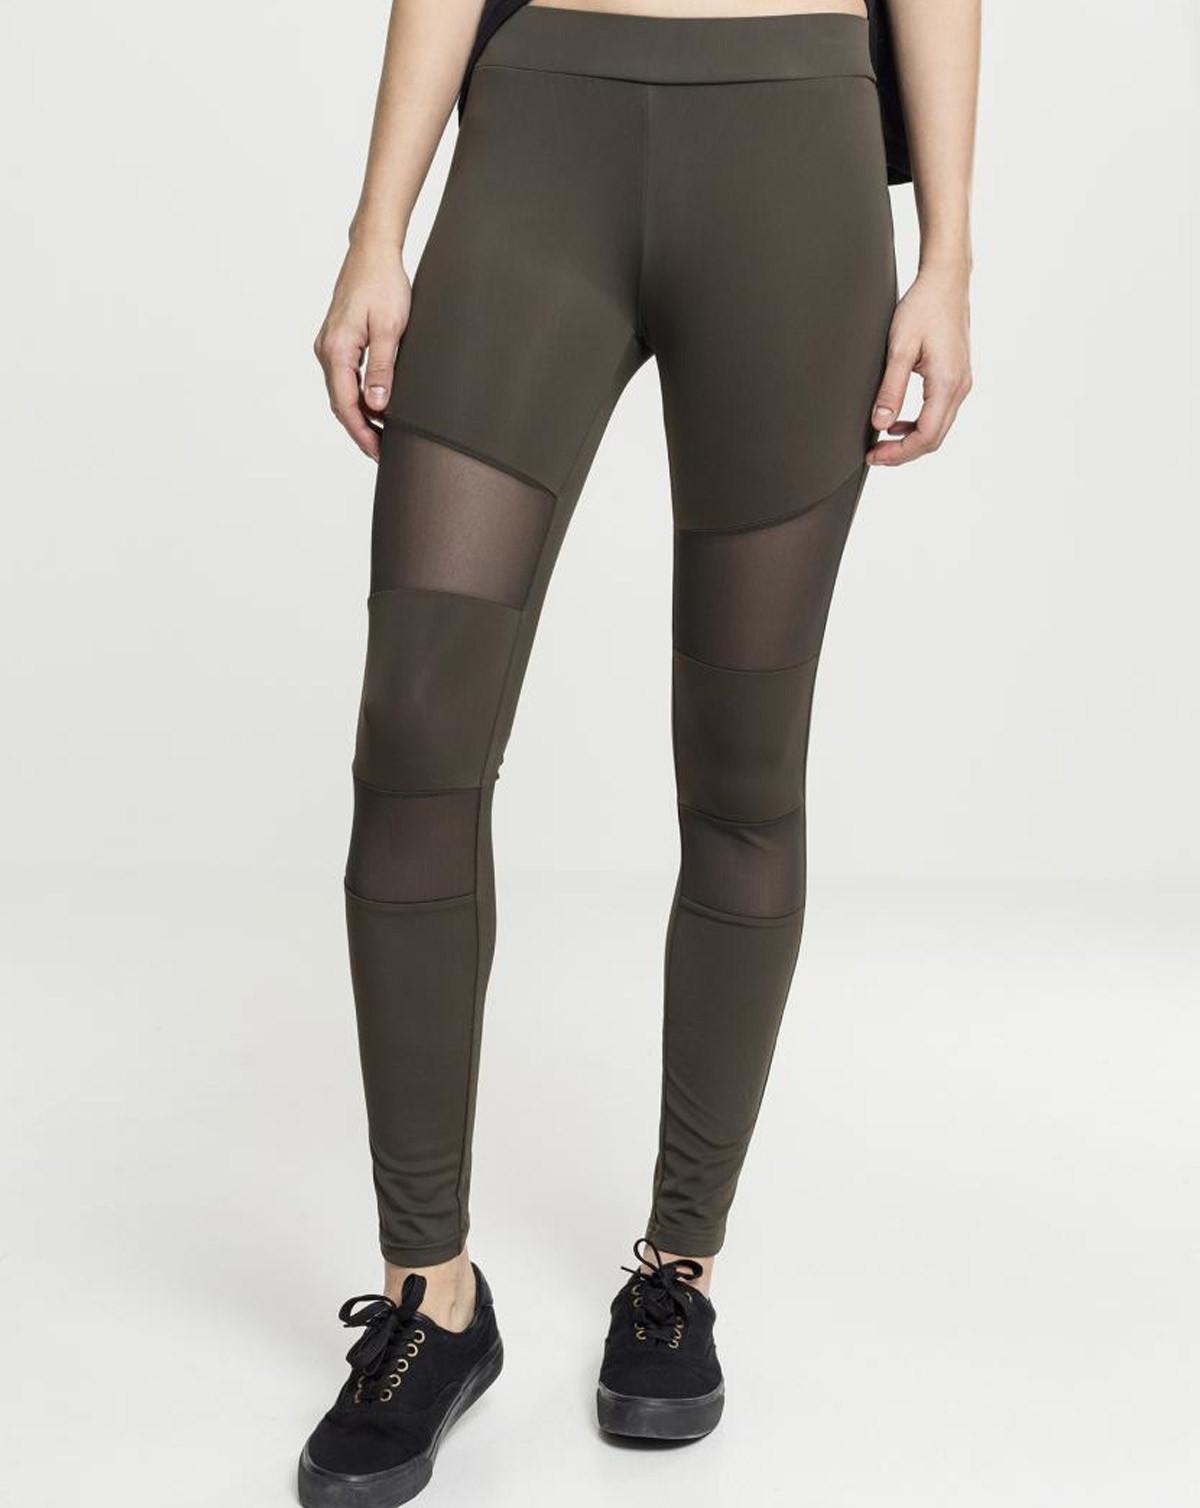 Urban Classics Ladies Tech Mesh Leggings (Dark Olive, 2XL)